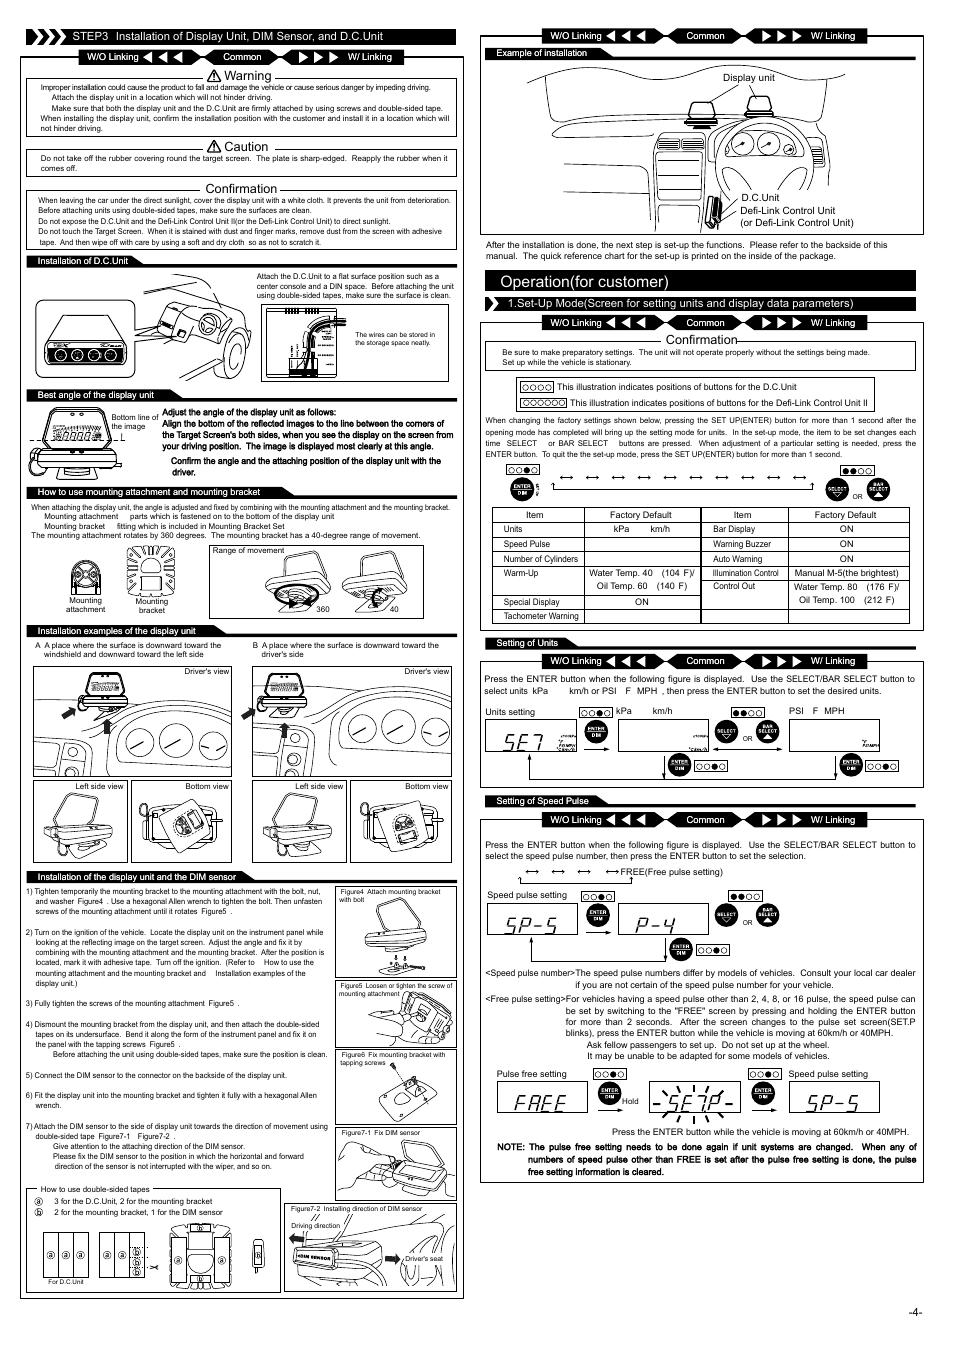 operation for customer confirmation warning defi link vsd x rh manualsdir com VFD Circuit Diagram Membranous VSD Echo